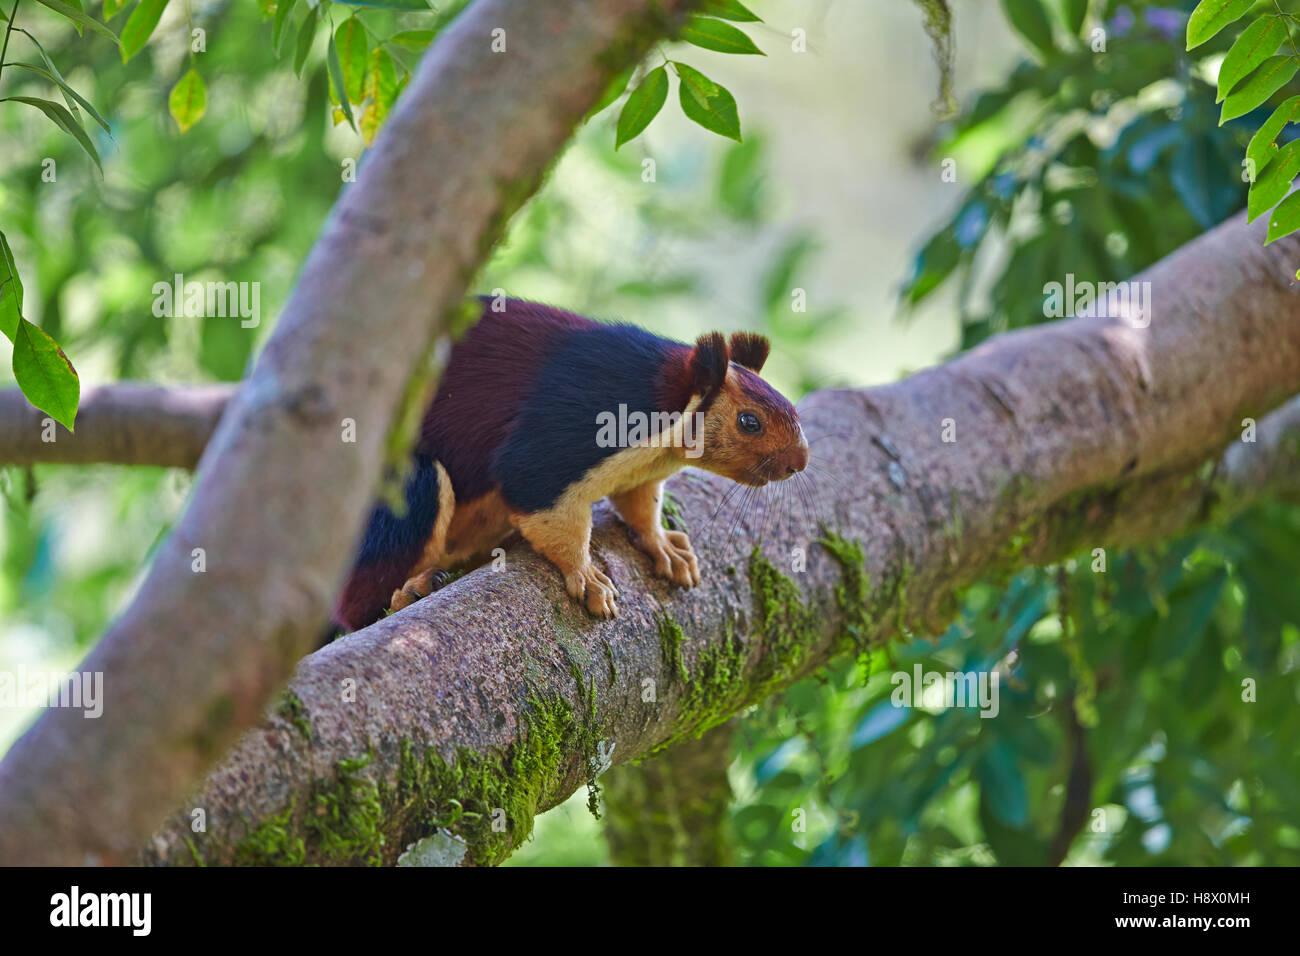 Indian giant squirrel on a branch - Anaimalai Mountain India Stock Photo